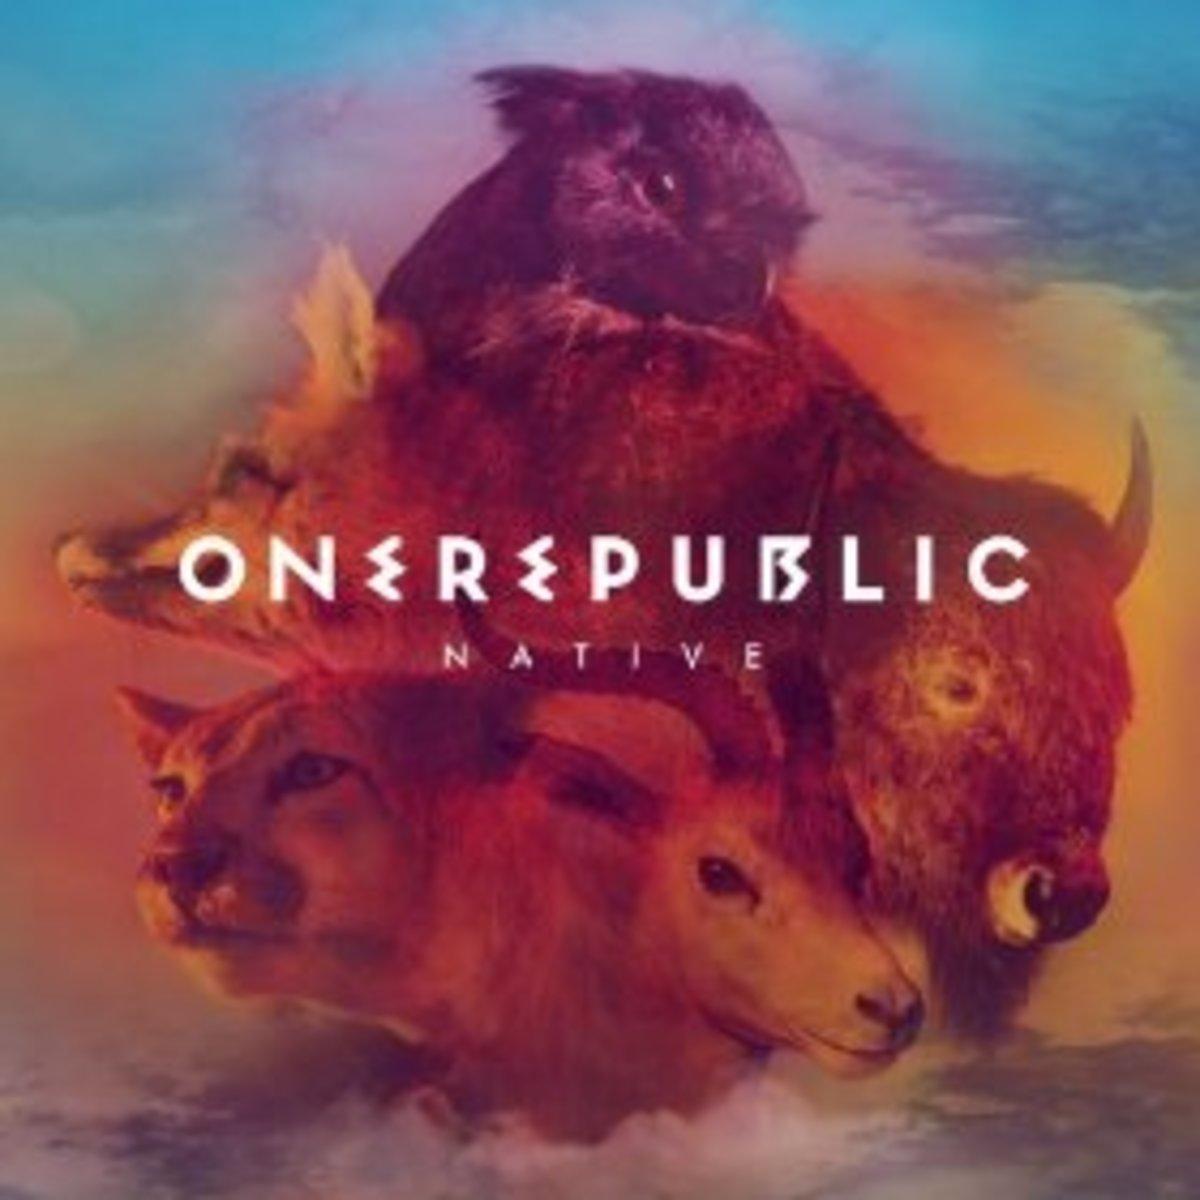 onerepublic-songs-counting-stars-meaning-and-lyrics